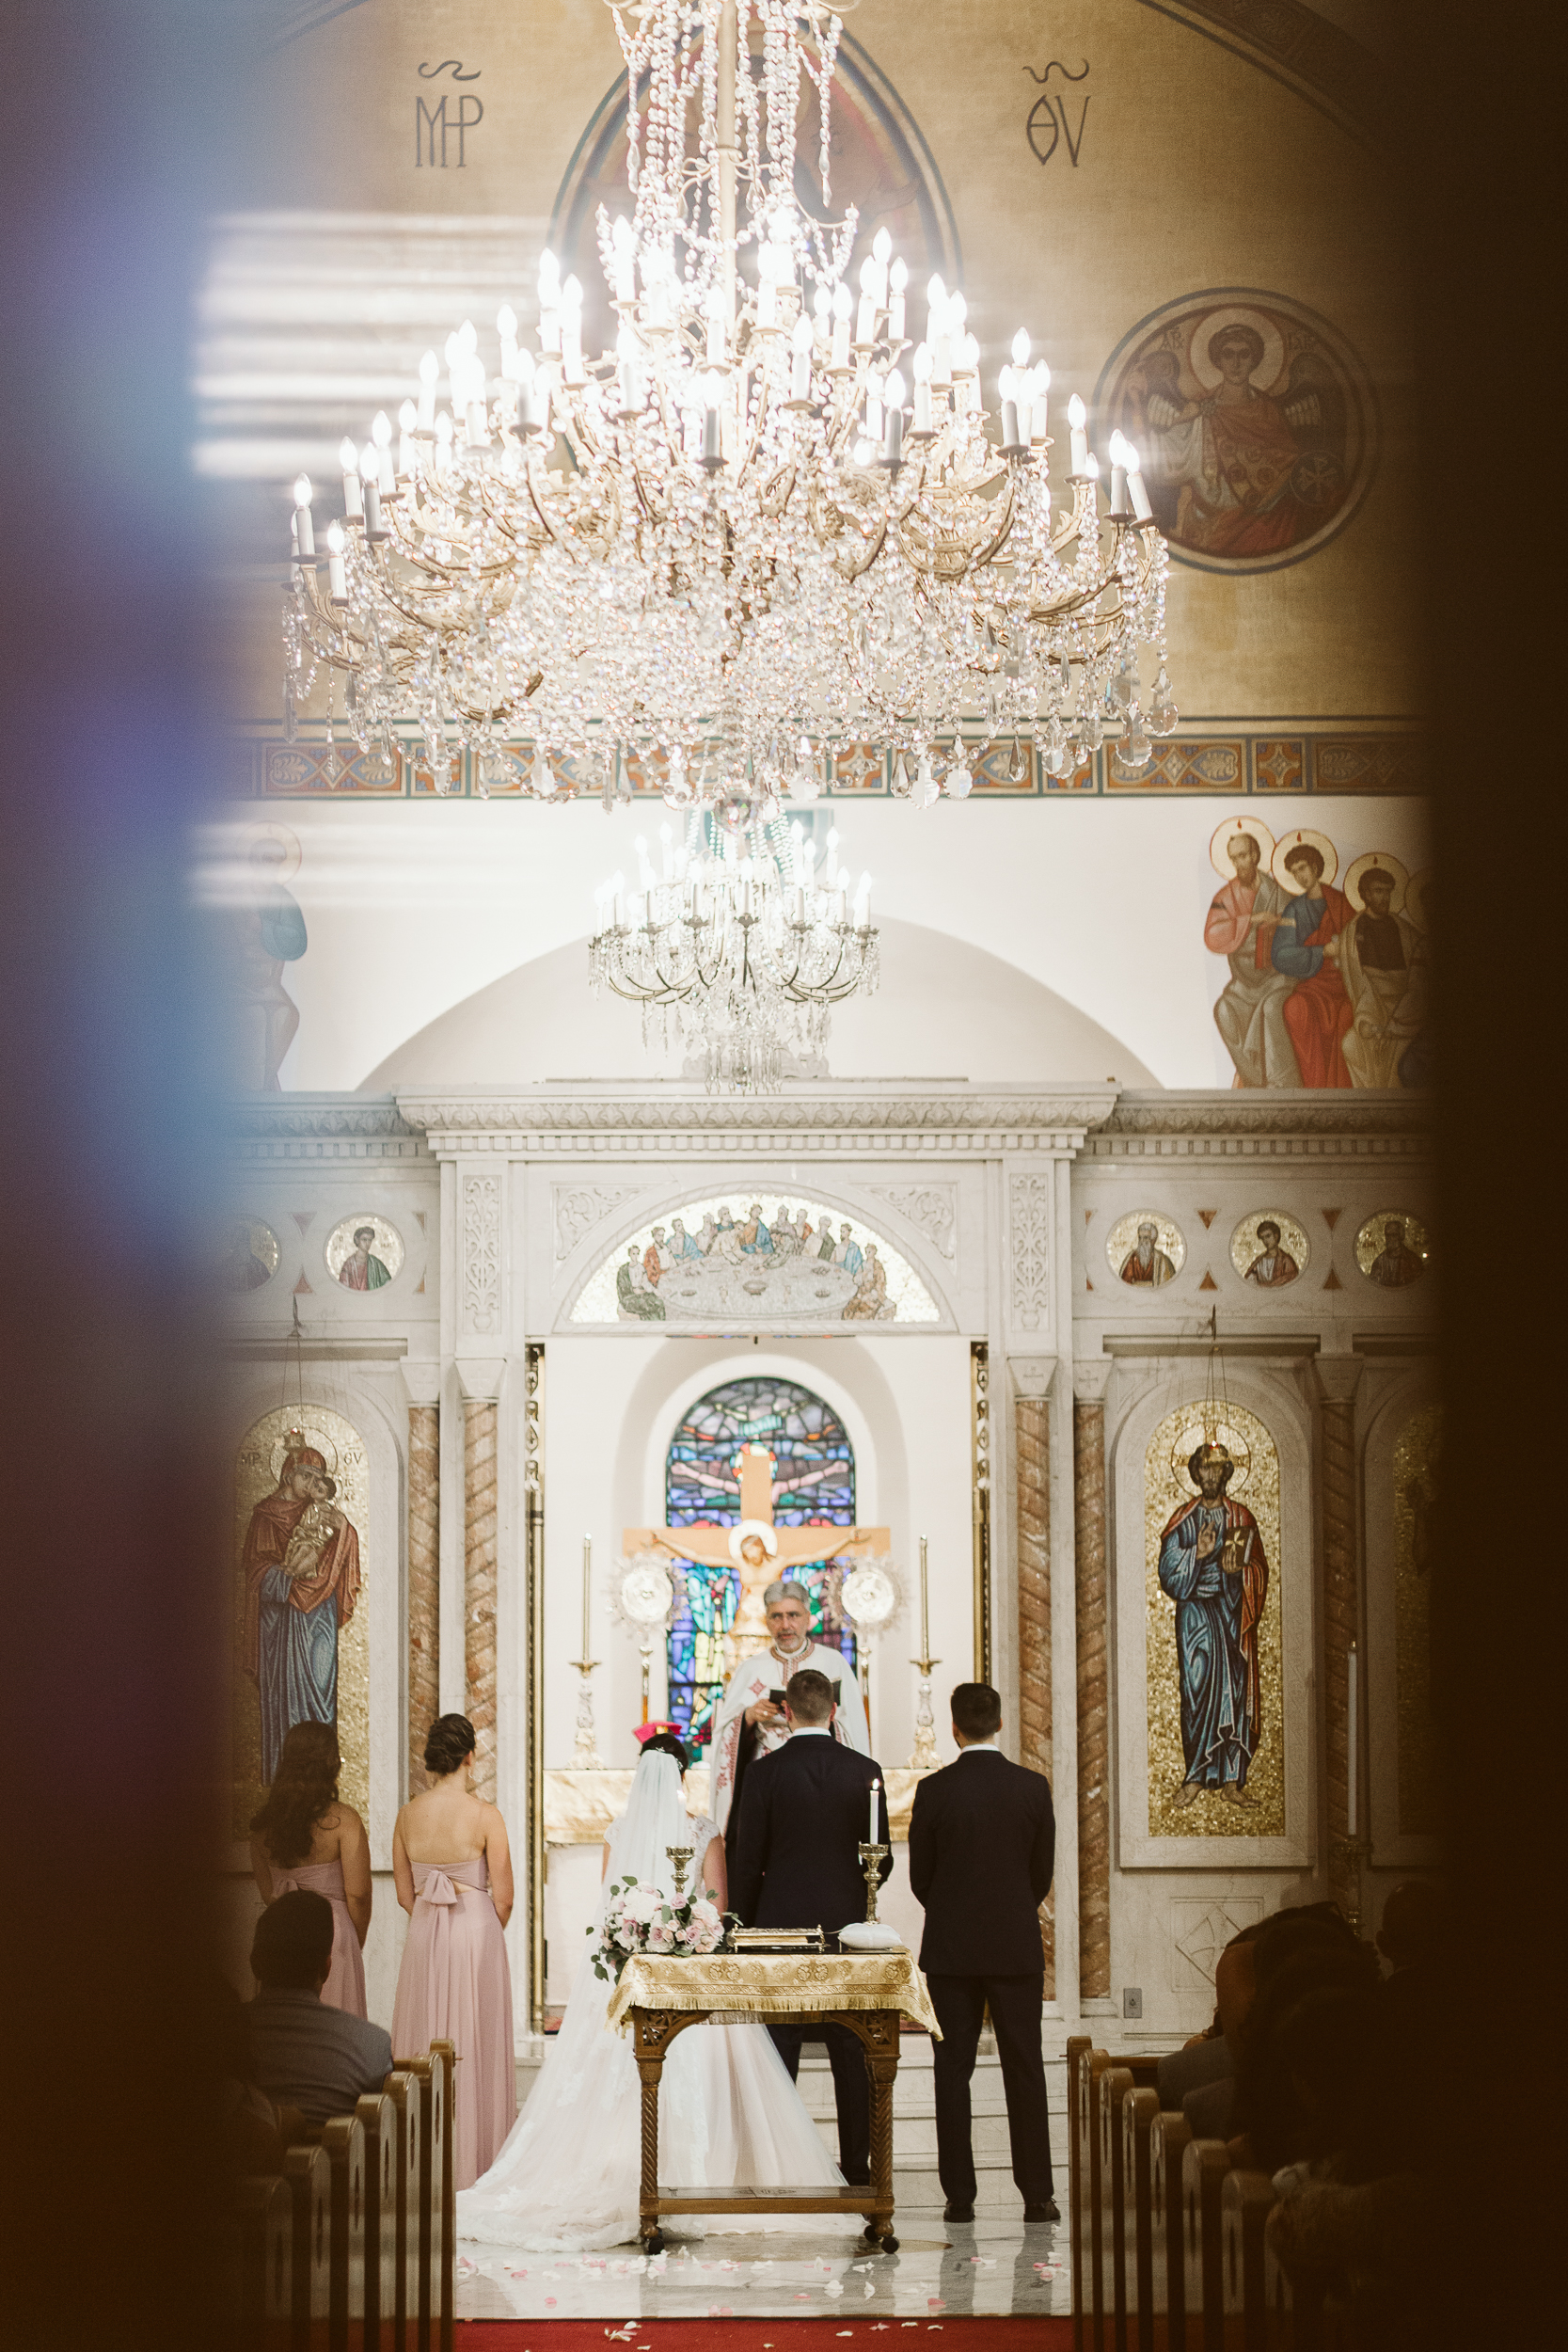 tupper-manor-wedding-photos-0007.JPG